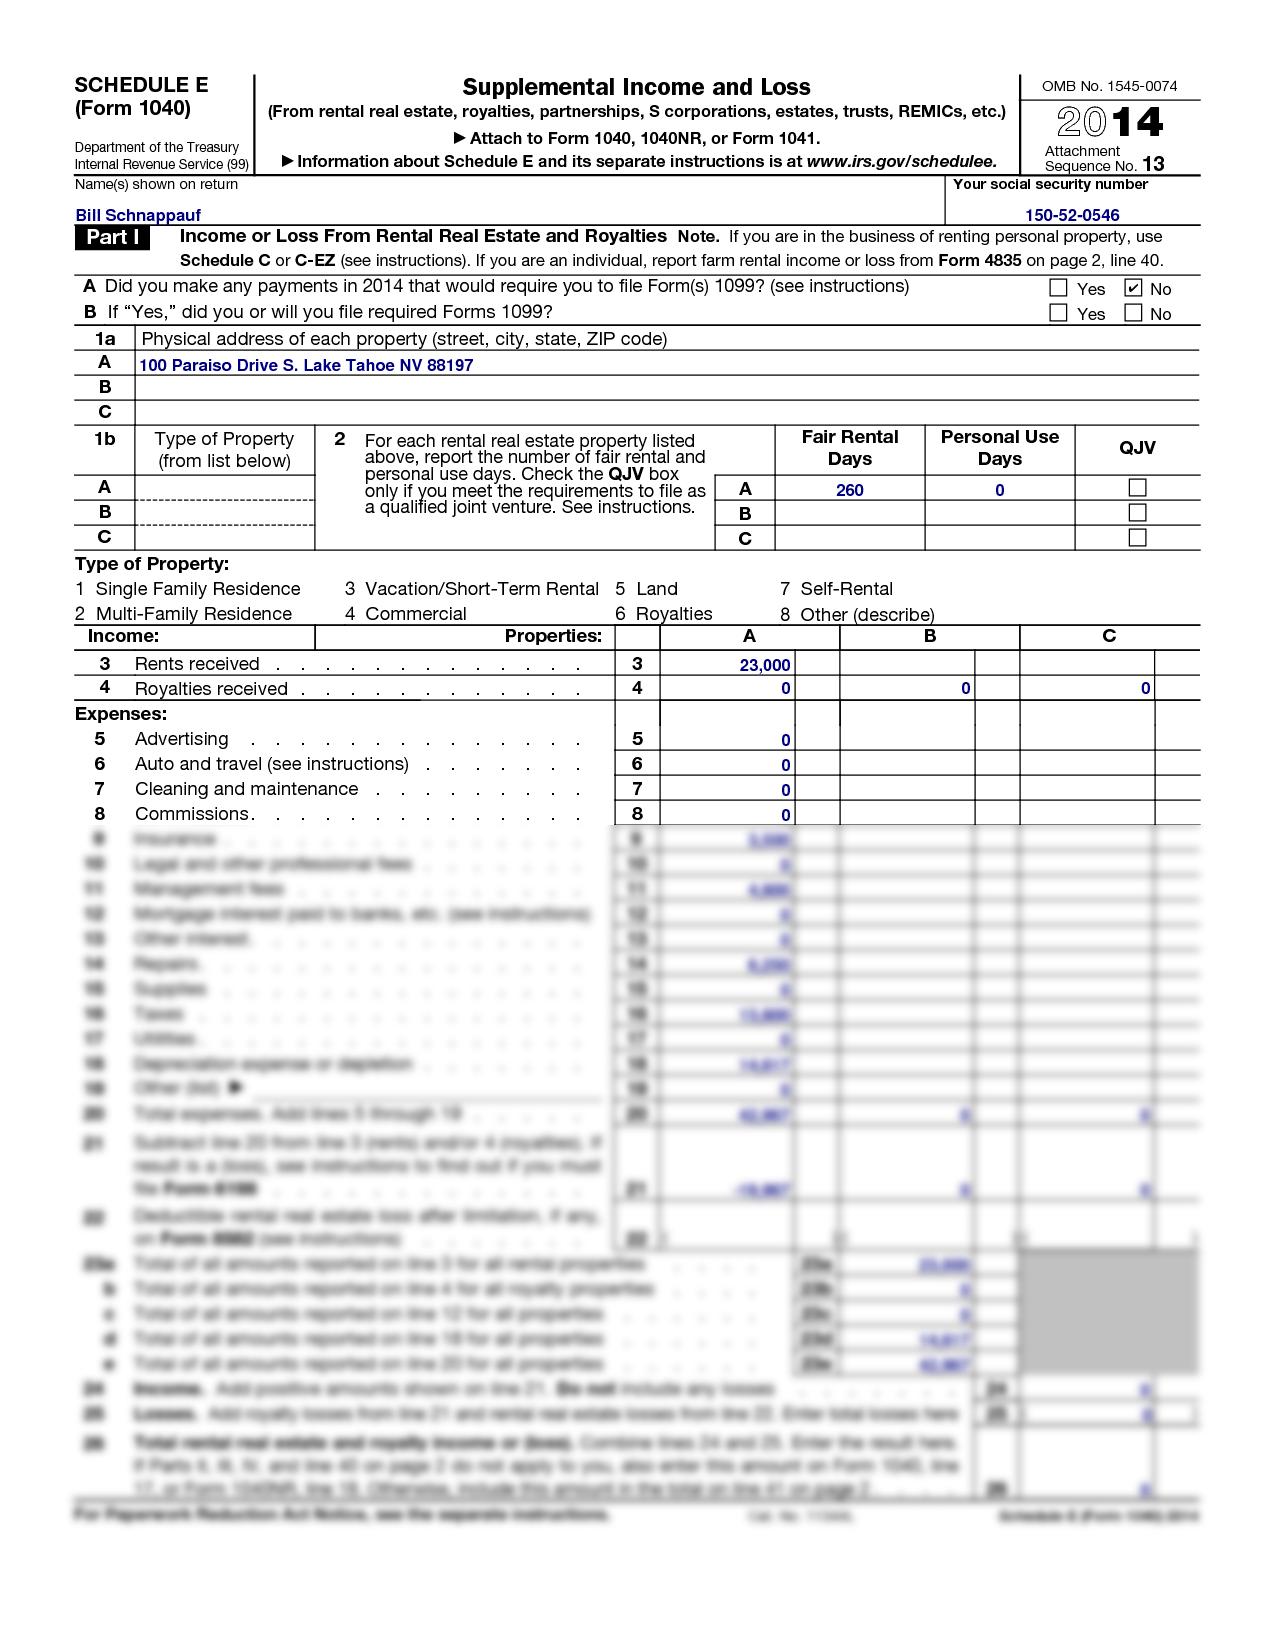 Solution Tax Returns Schnappauf Schedule E 2014 Studypool